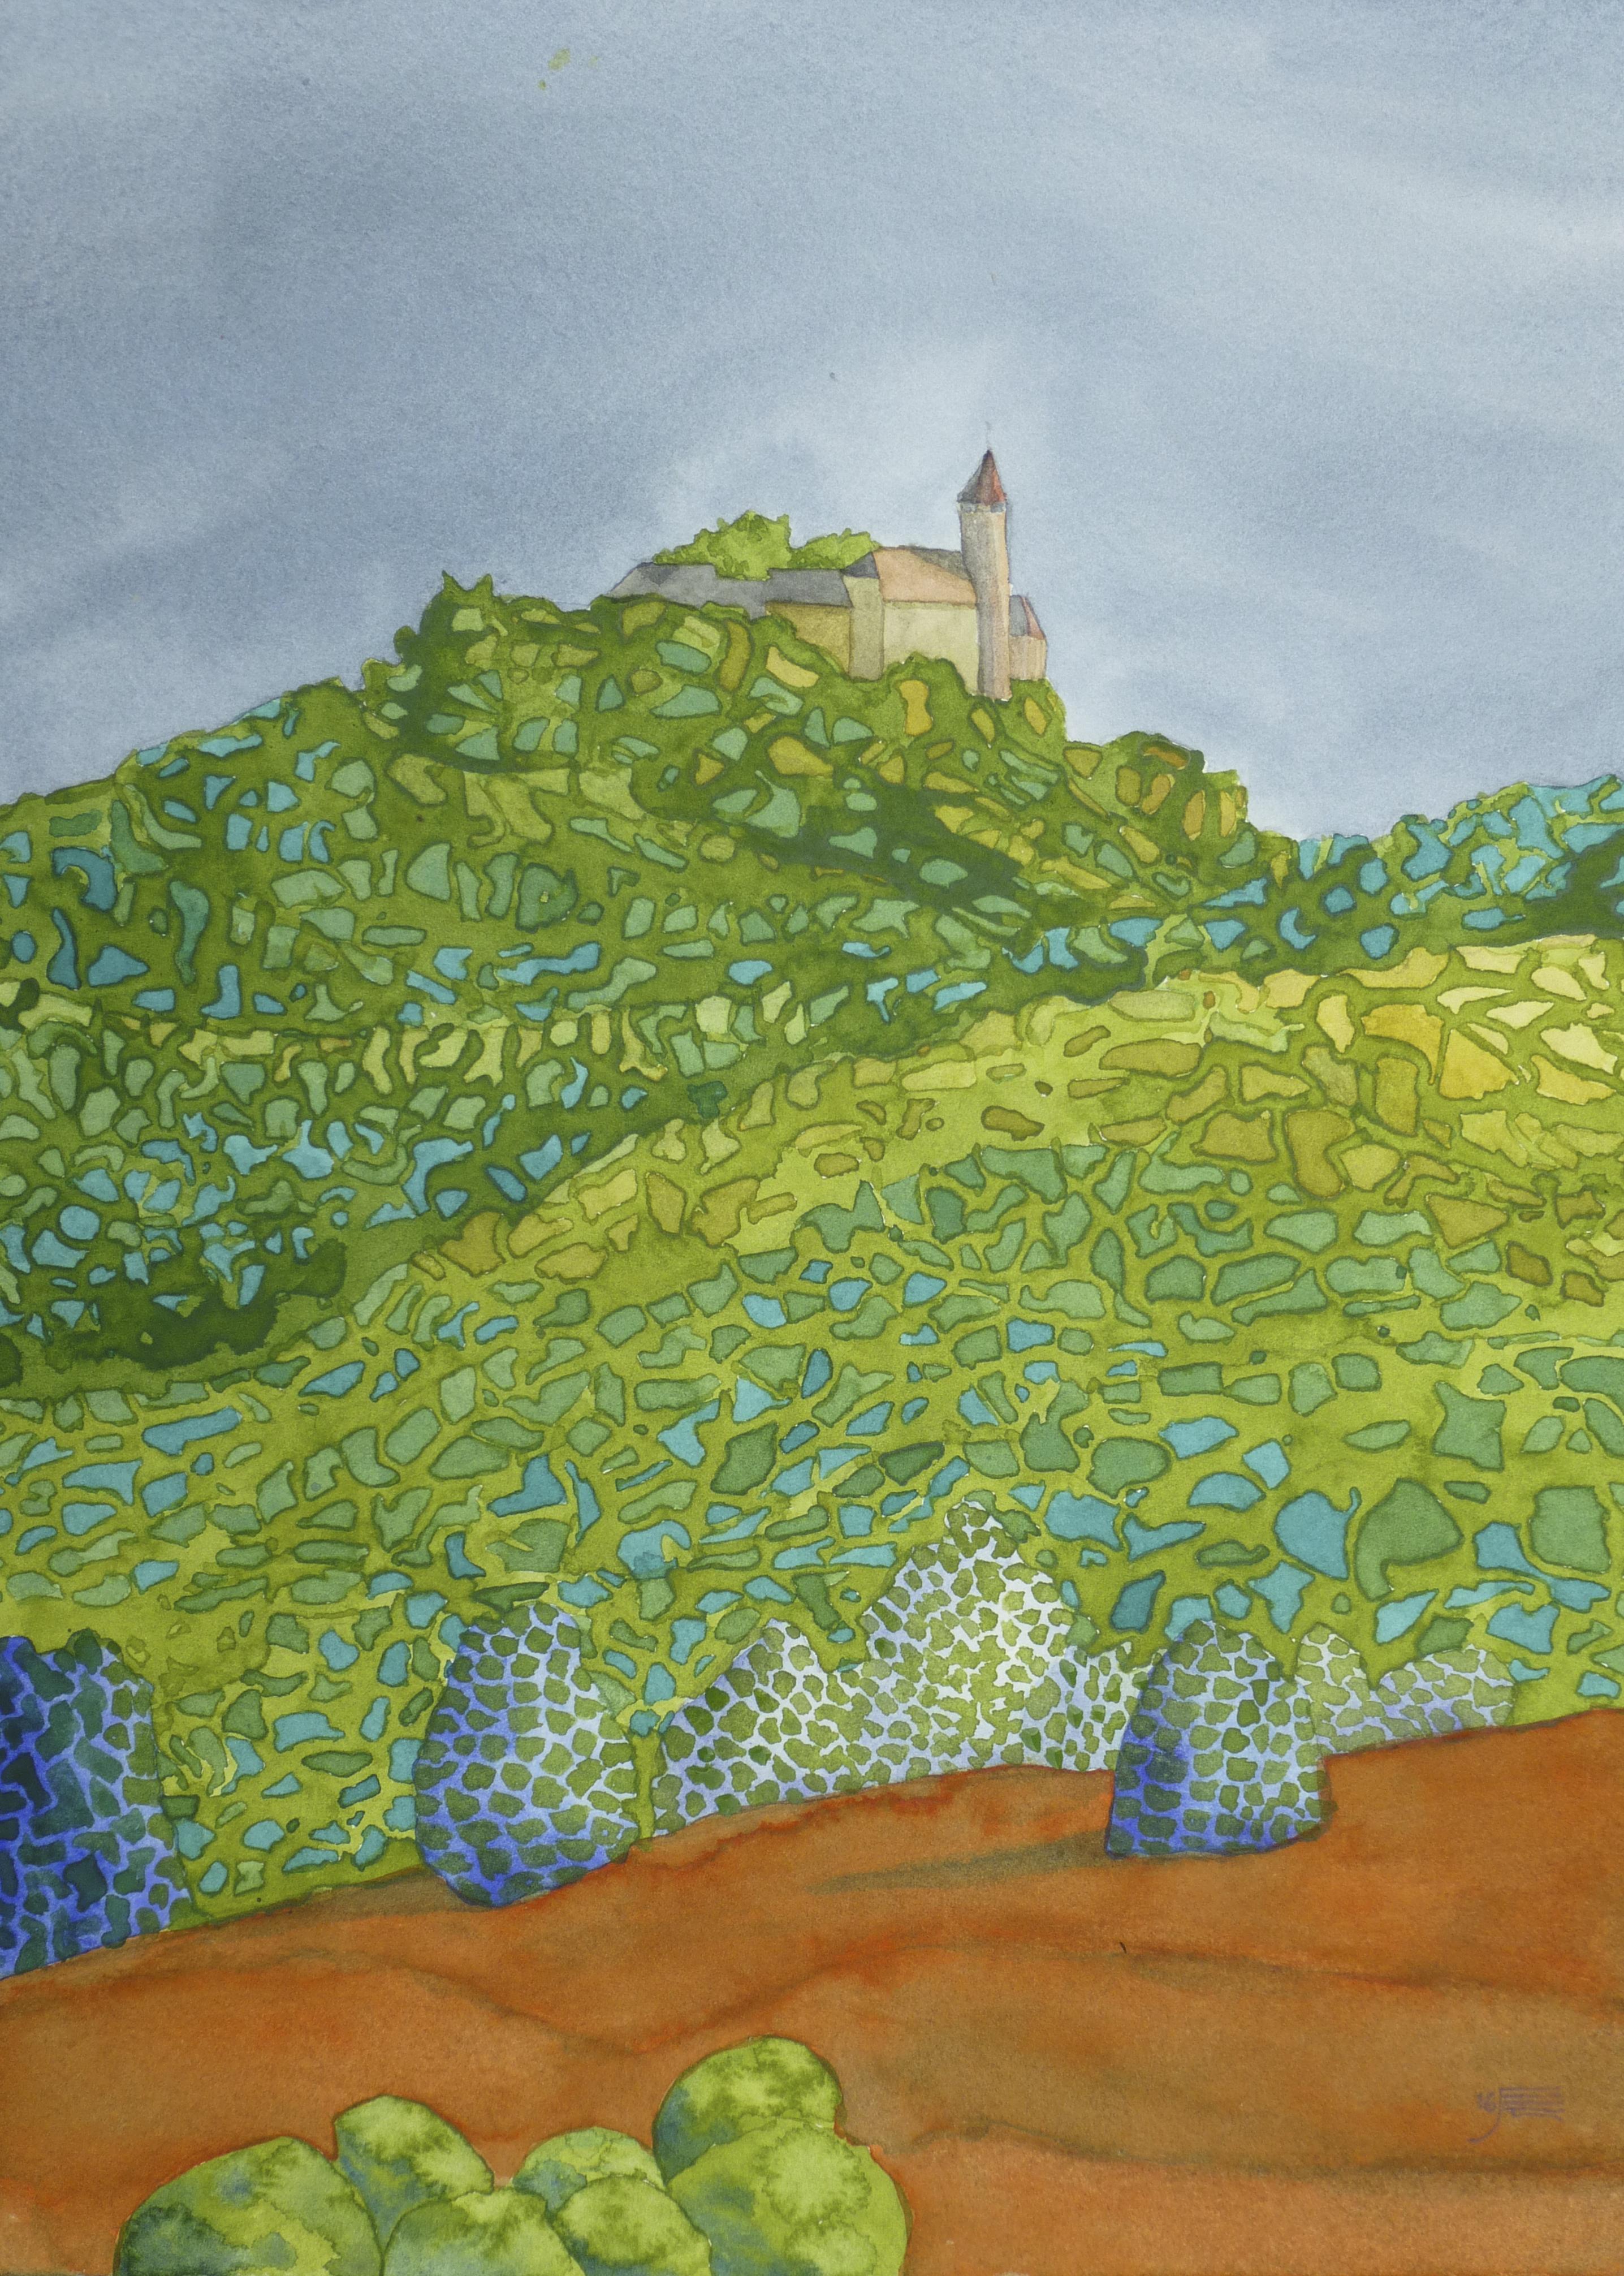 Teck von Nabern, 2016, Aquarell, 23 x 31 cm